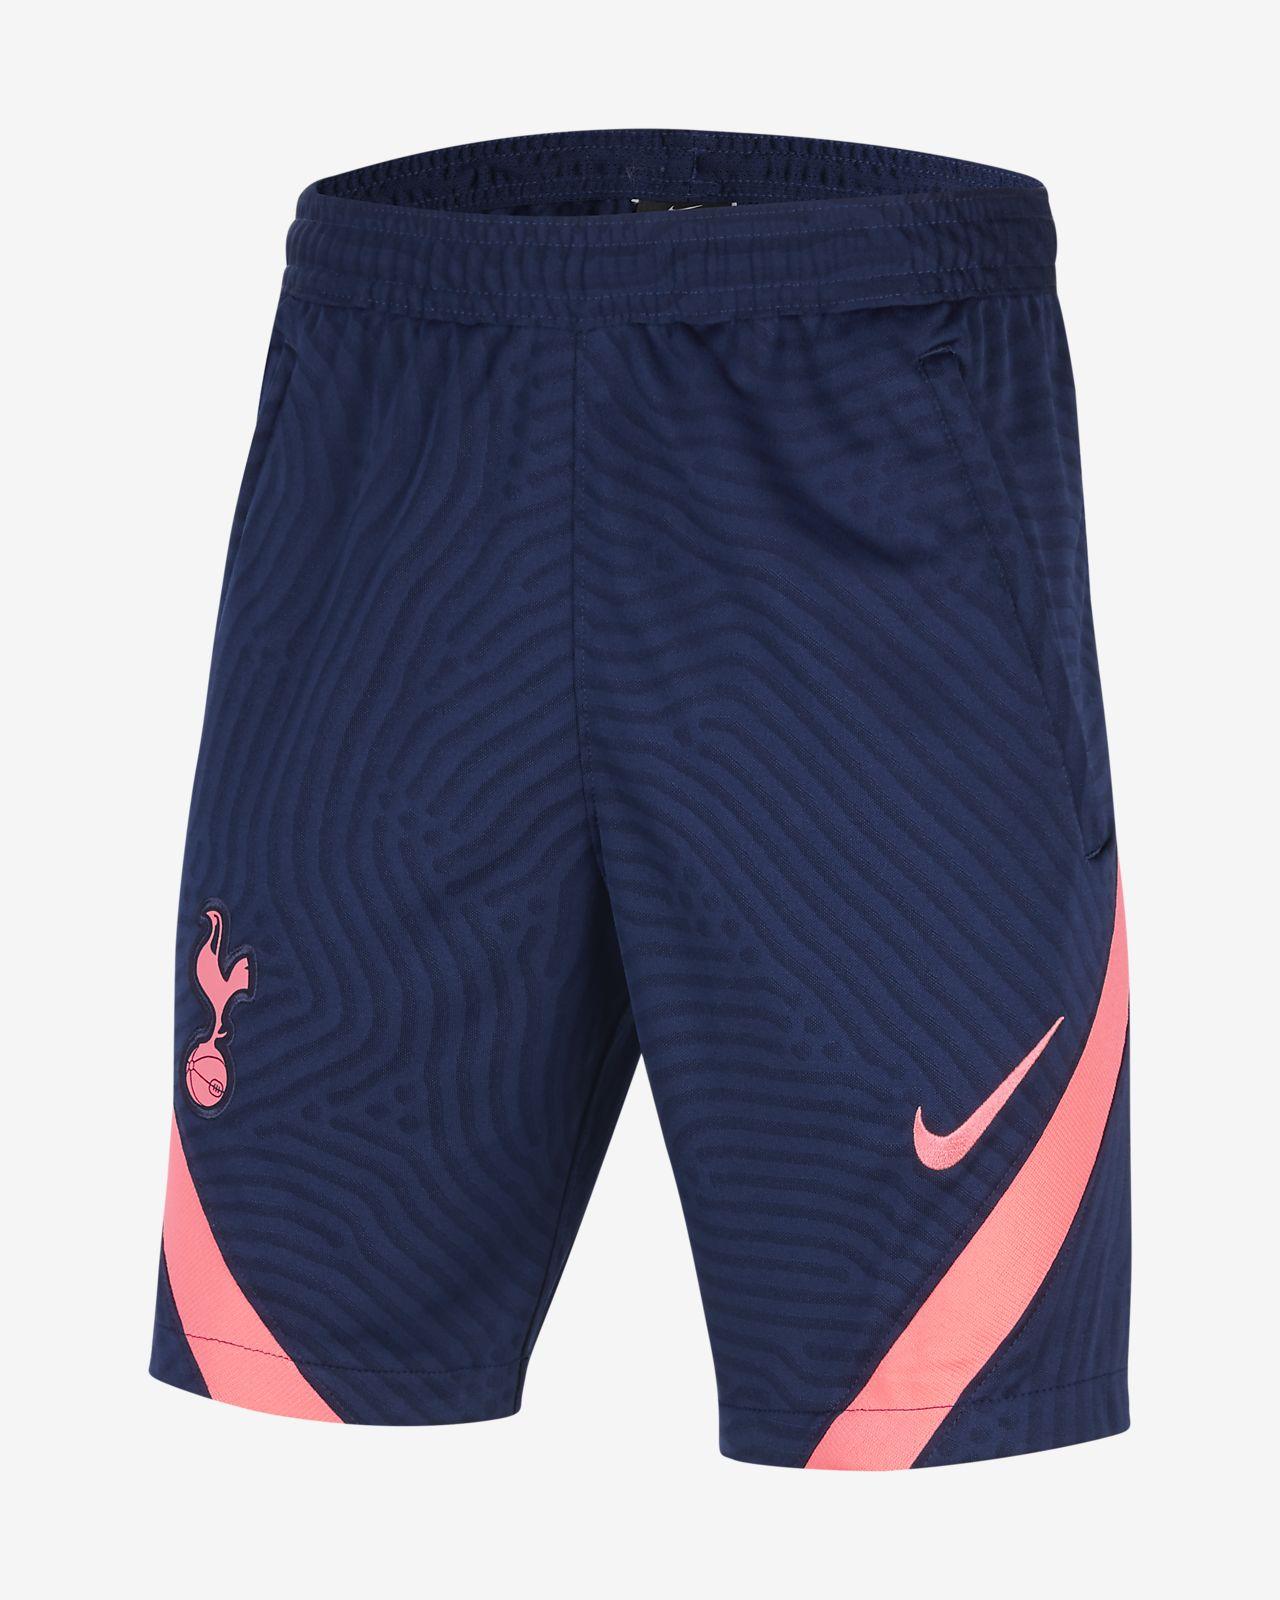 Tottenham Hotspur Strike Older Kids' Knit Football Shorts